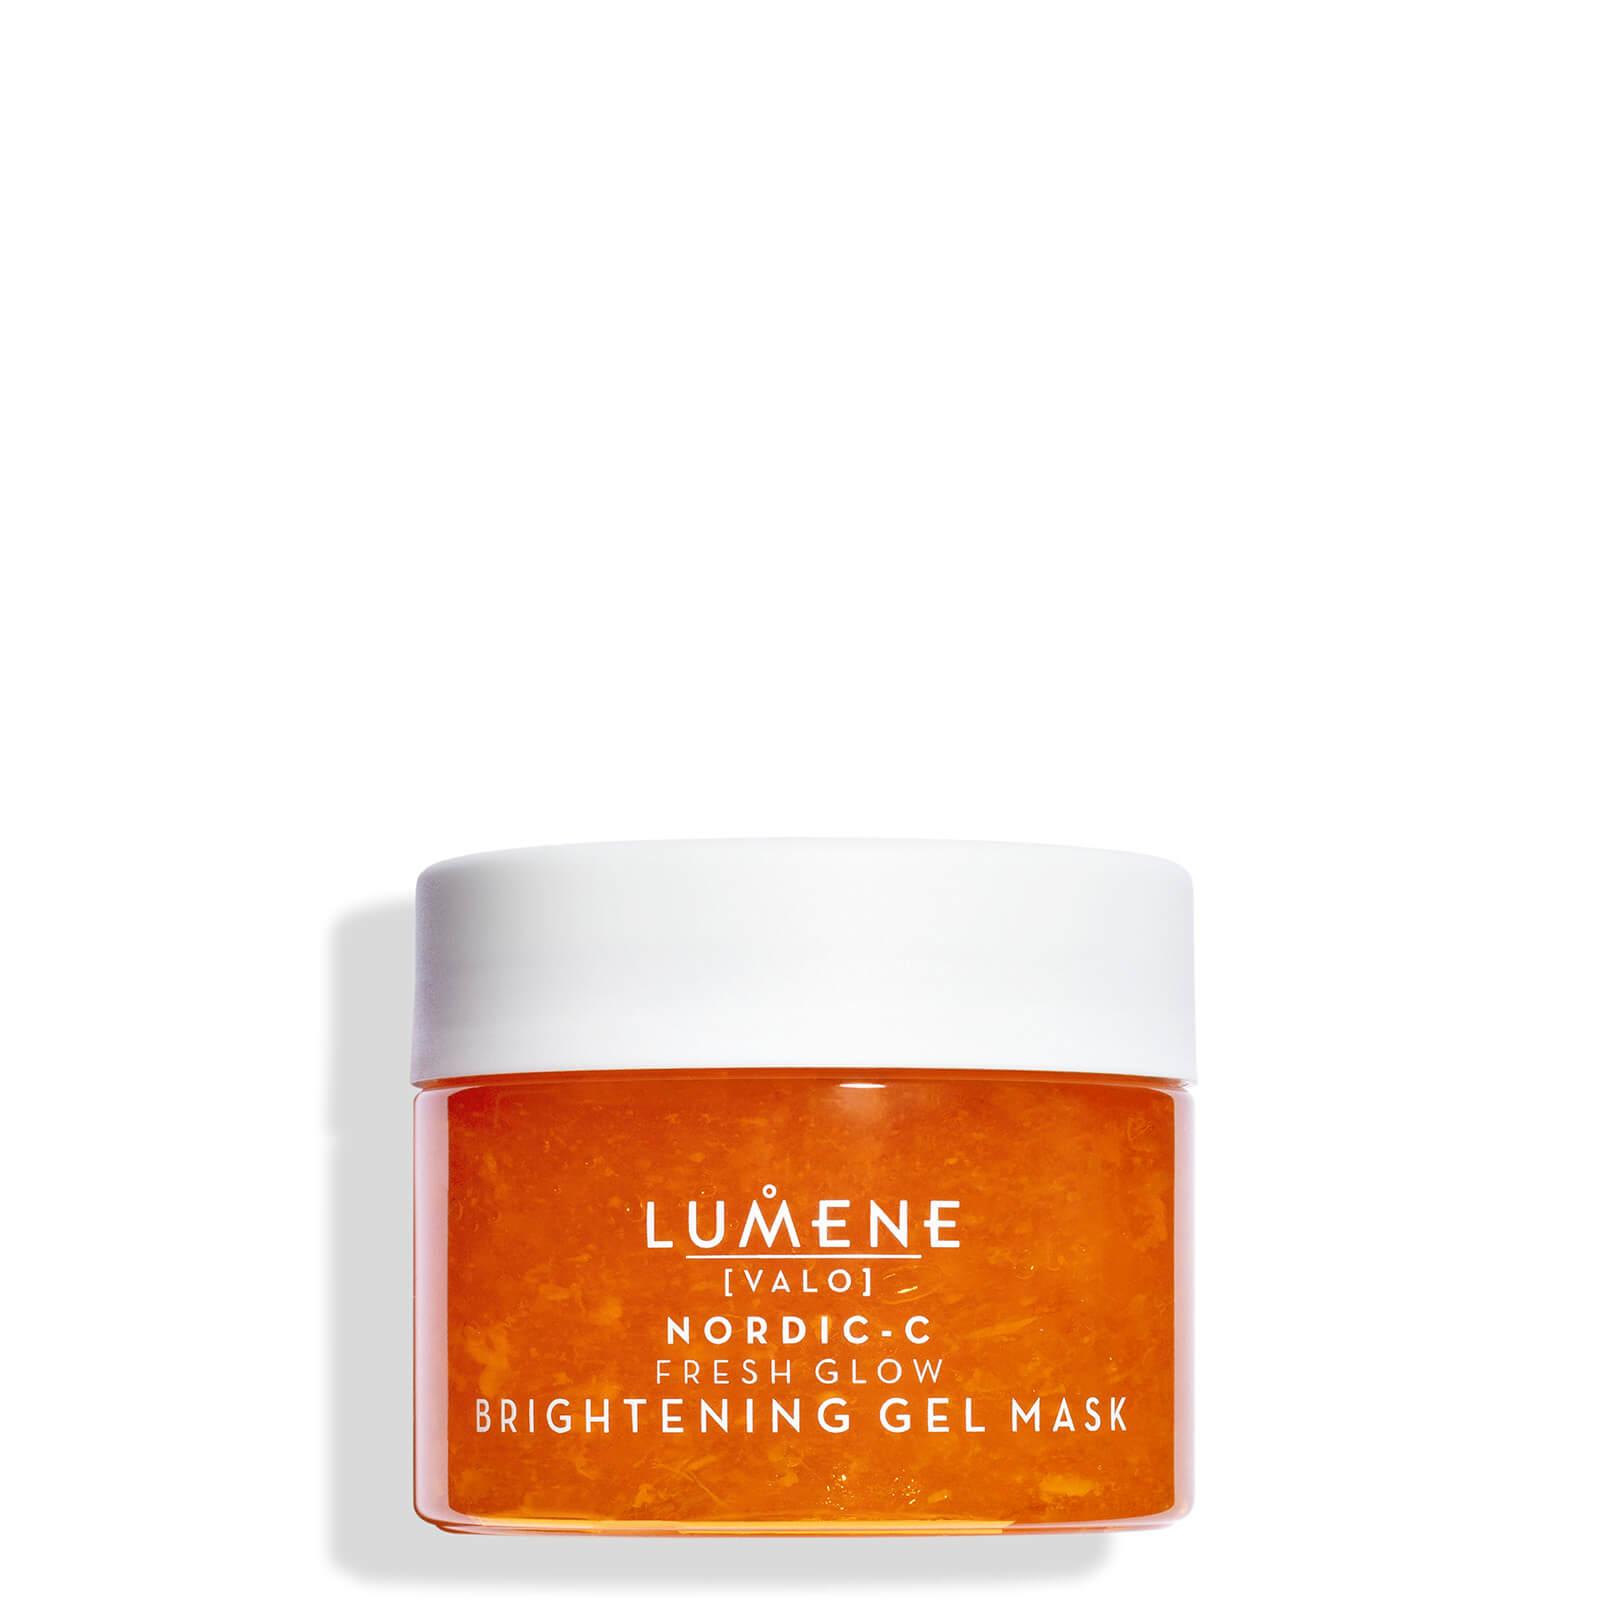 Купить Lumene NORDIC-C [VALO] Fresh Glow Brightening Gel Mask 150ml